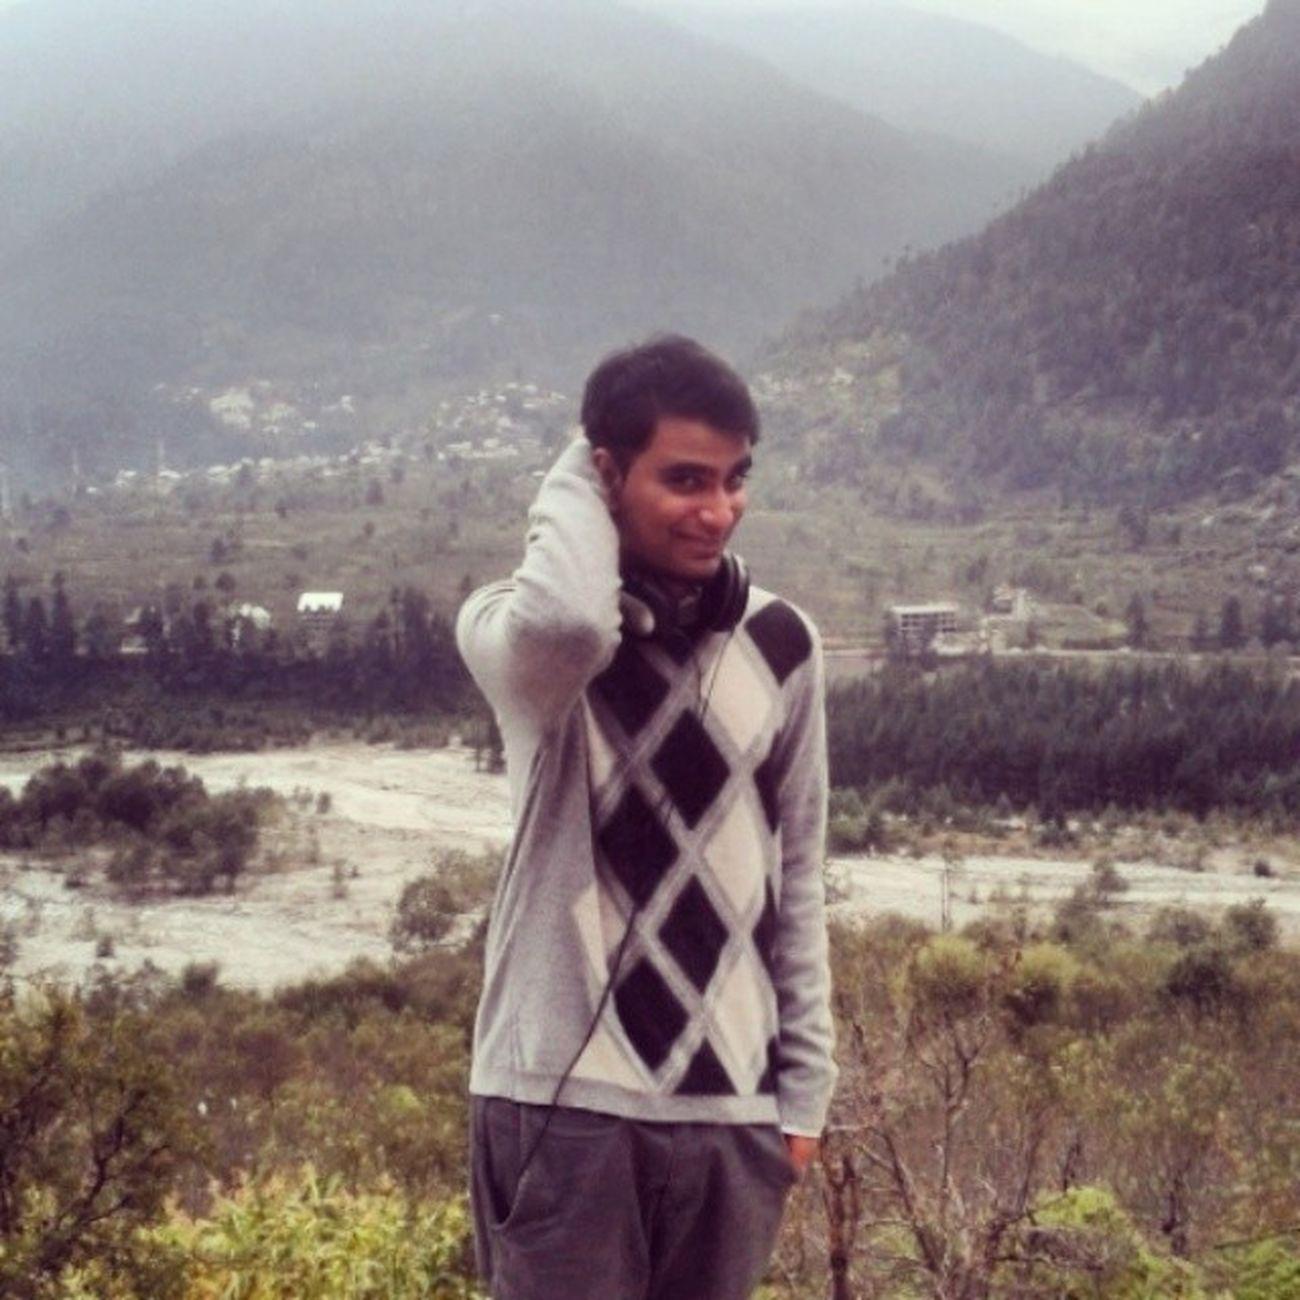 Manali <3 Photocredits Van17 Manali Himalayas Collegelife Collegetrip Instaedit Igers Himachal Mountains Cold Thandd Funtimes GoodTimes POTD Picoftheday Wanderlust Followforfollow Likeforlike Desi Newdelhi